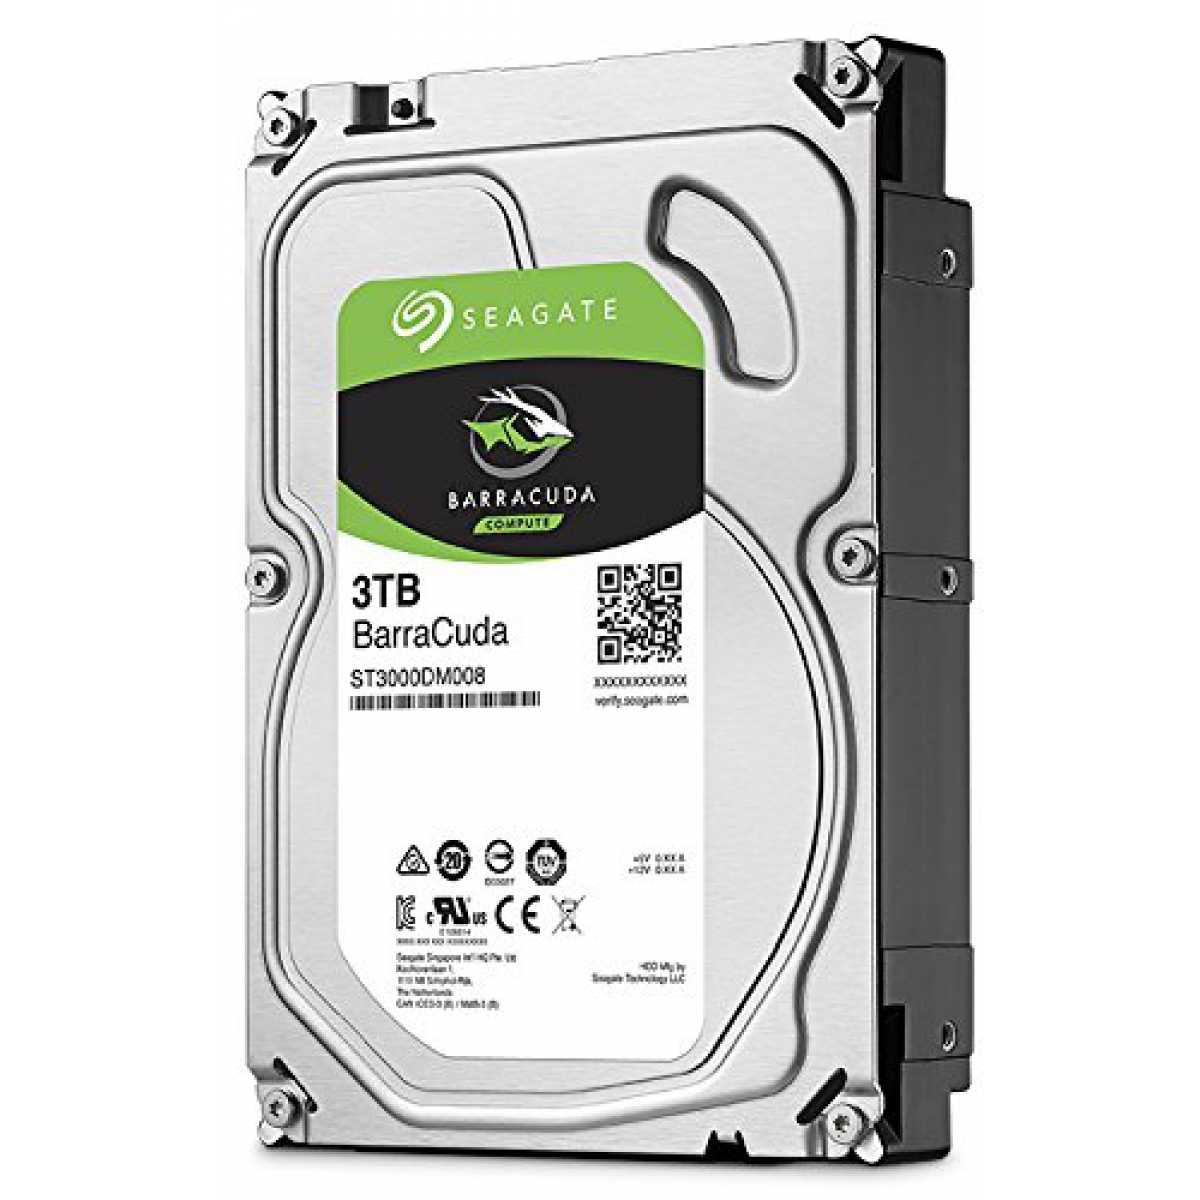 HD Seagate BarraCuda 3TB, Sata III, 7200RPM, 64MB, ST3000DM008